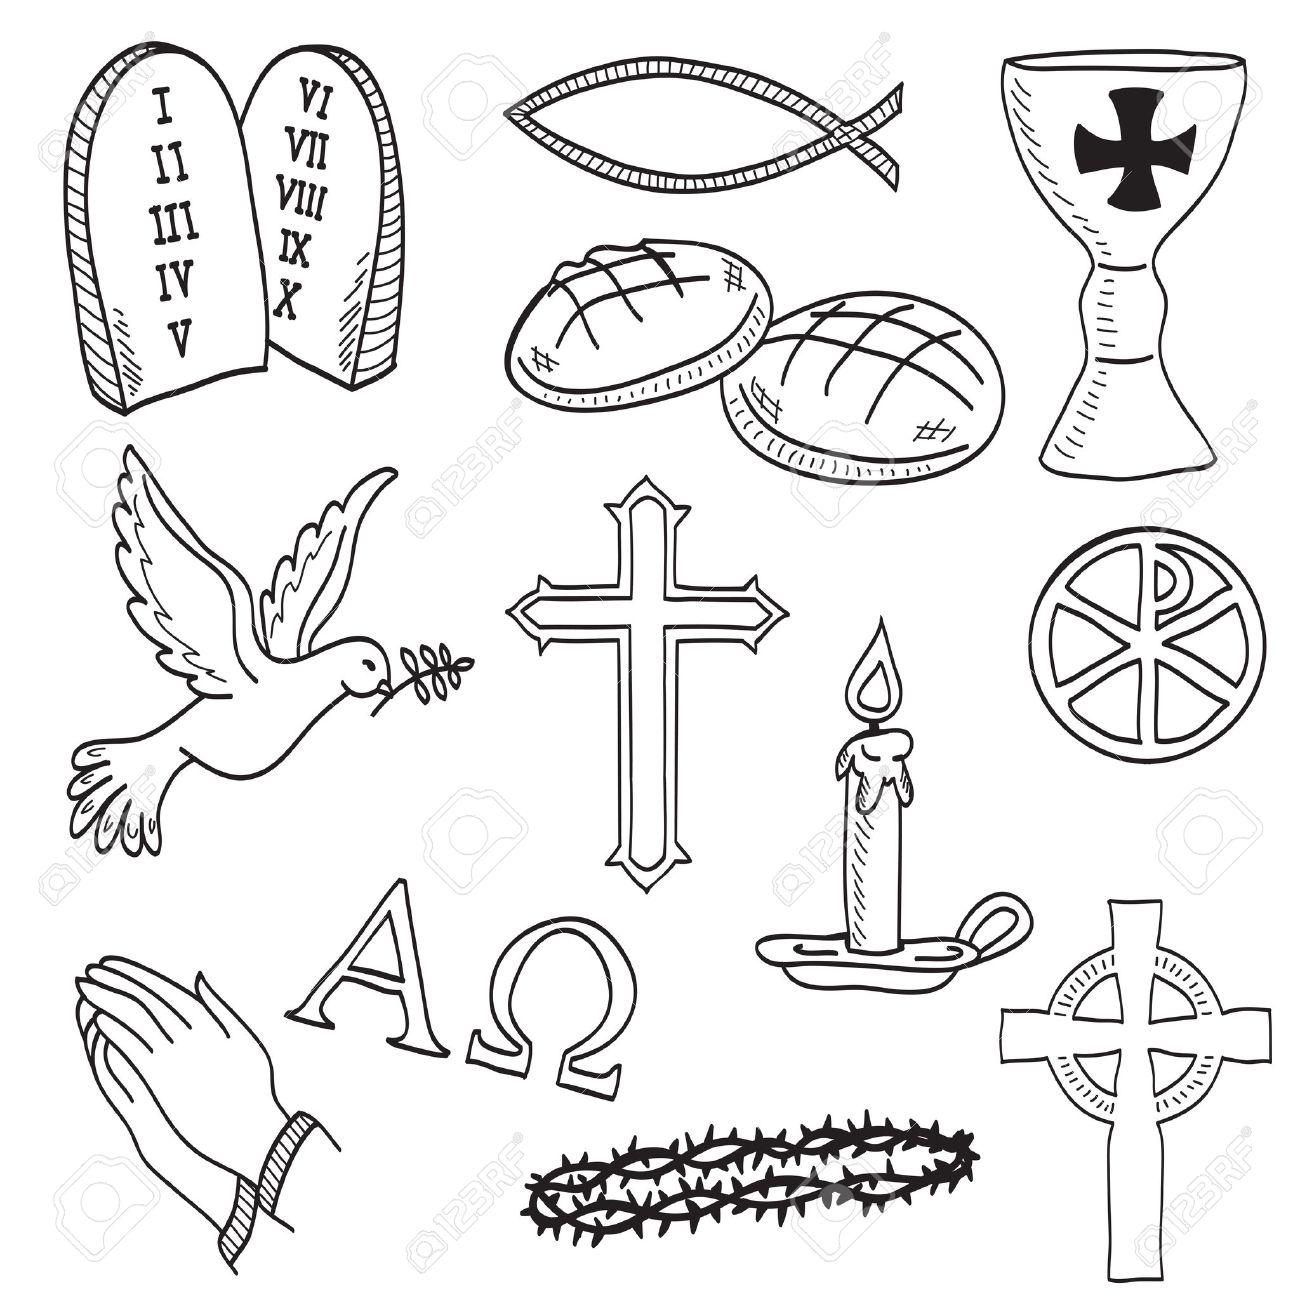 Christian Hand Drawn Symbols Illustration Cross Hands Fish